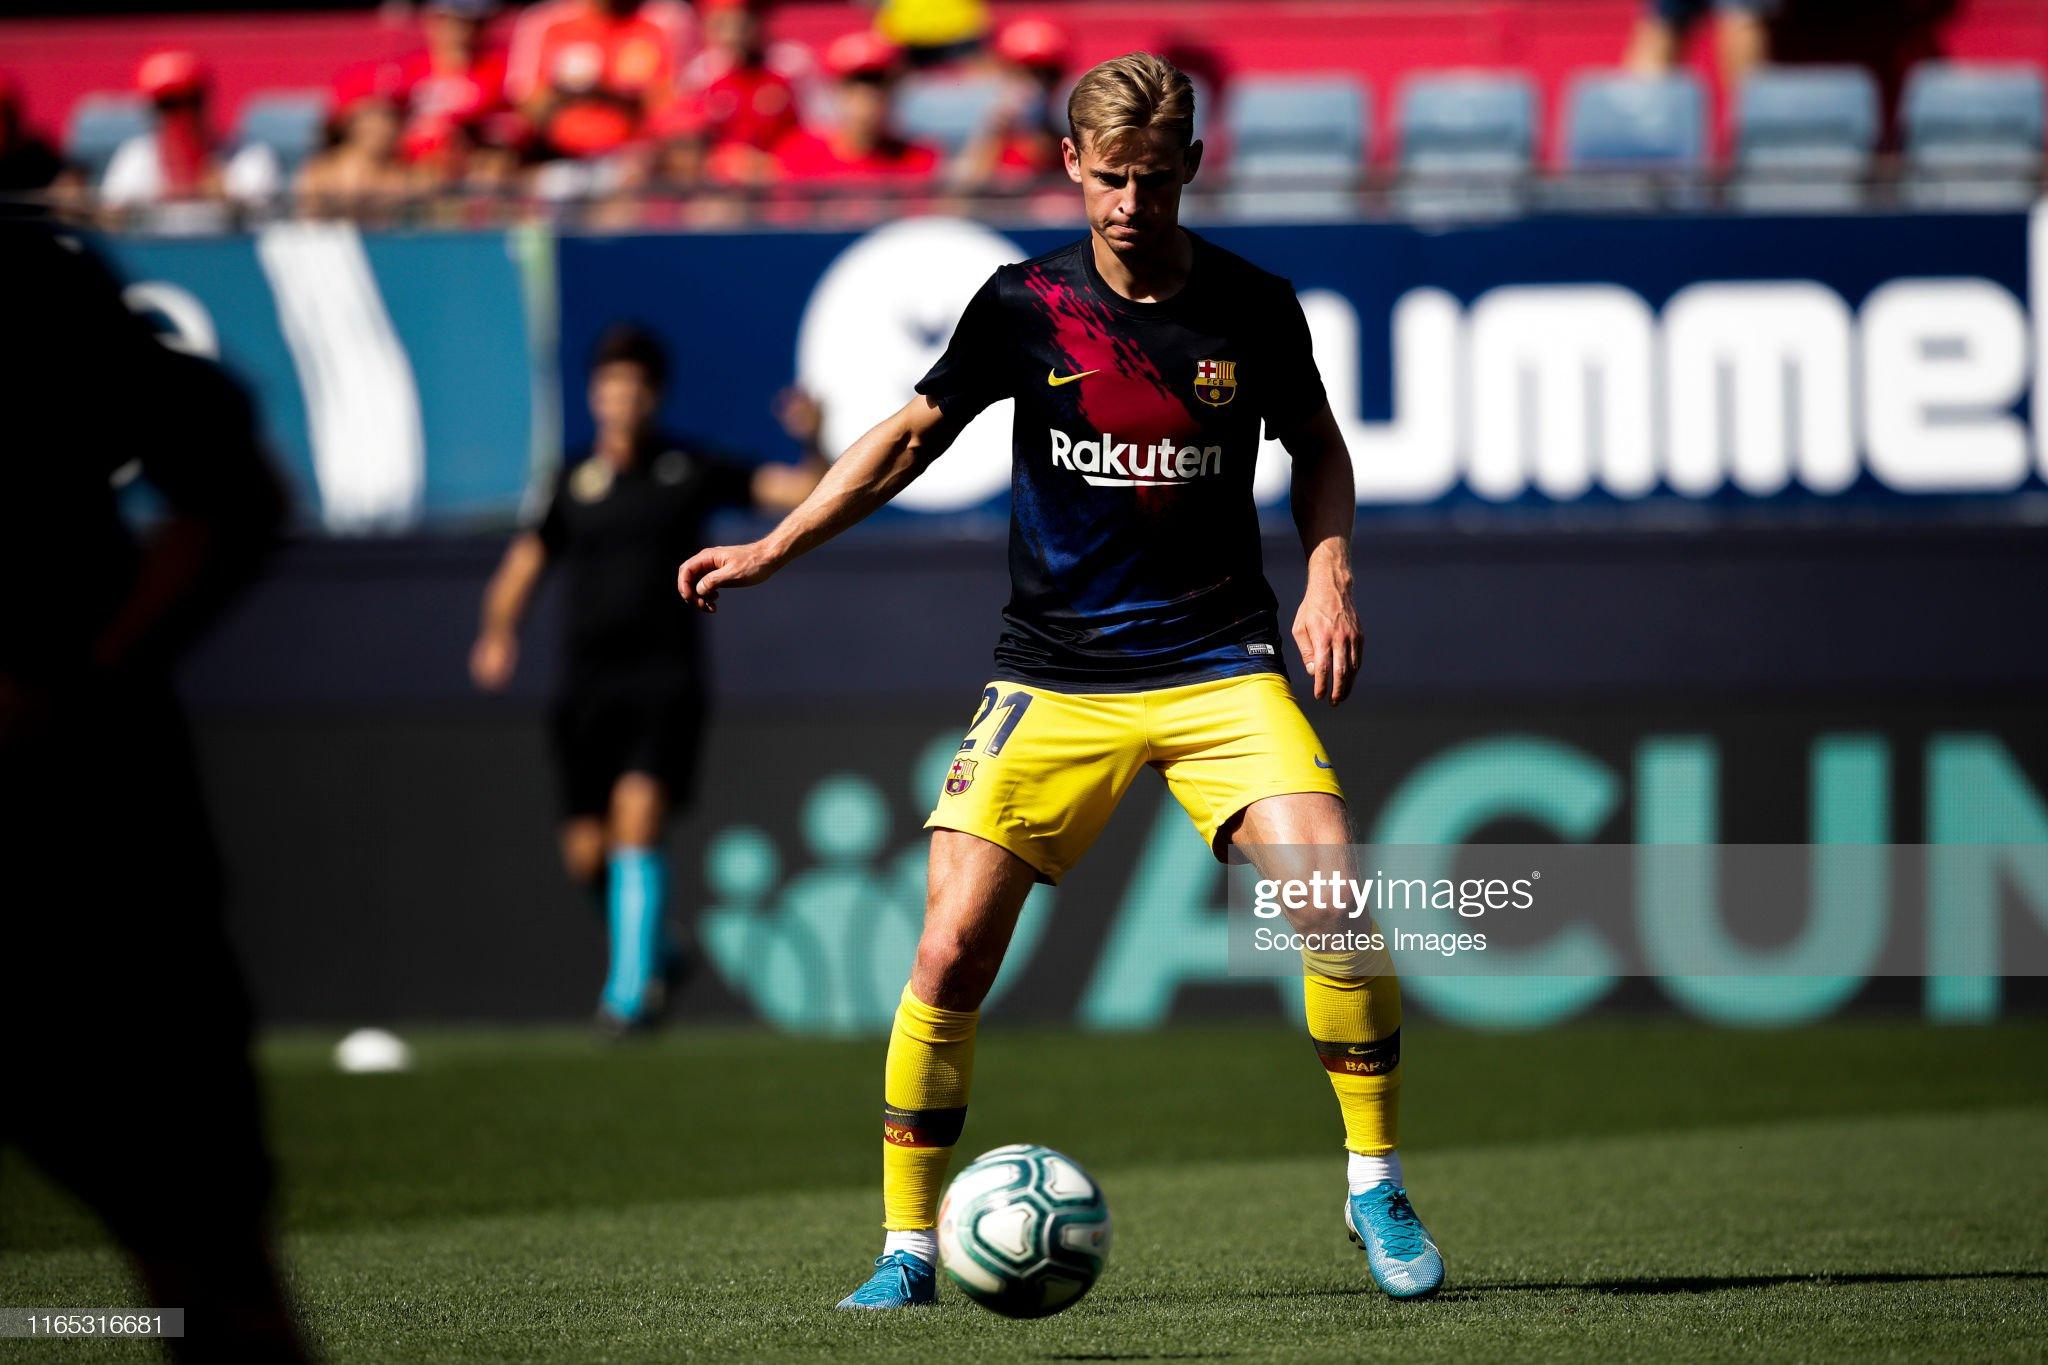 صور مباراة : أوساسونا - برشلونة 2-2 ( 31-08-2019 )  Frenkie-de-jong-of-fc-barcelona-during-the-la-liga-santander-match-picture-id1165316681?s=2048x2048